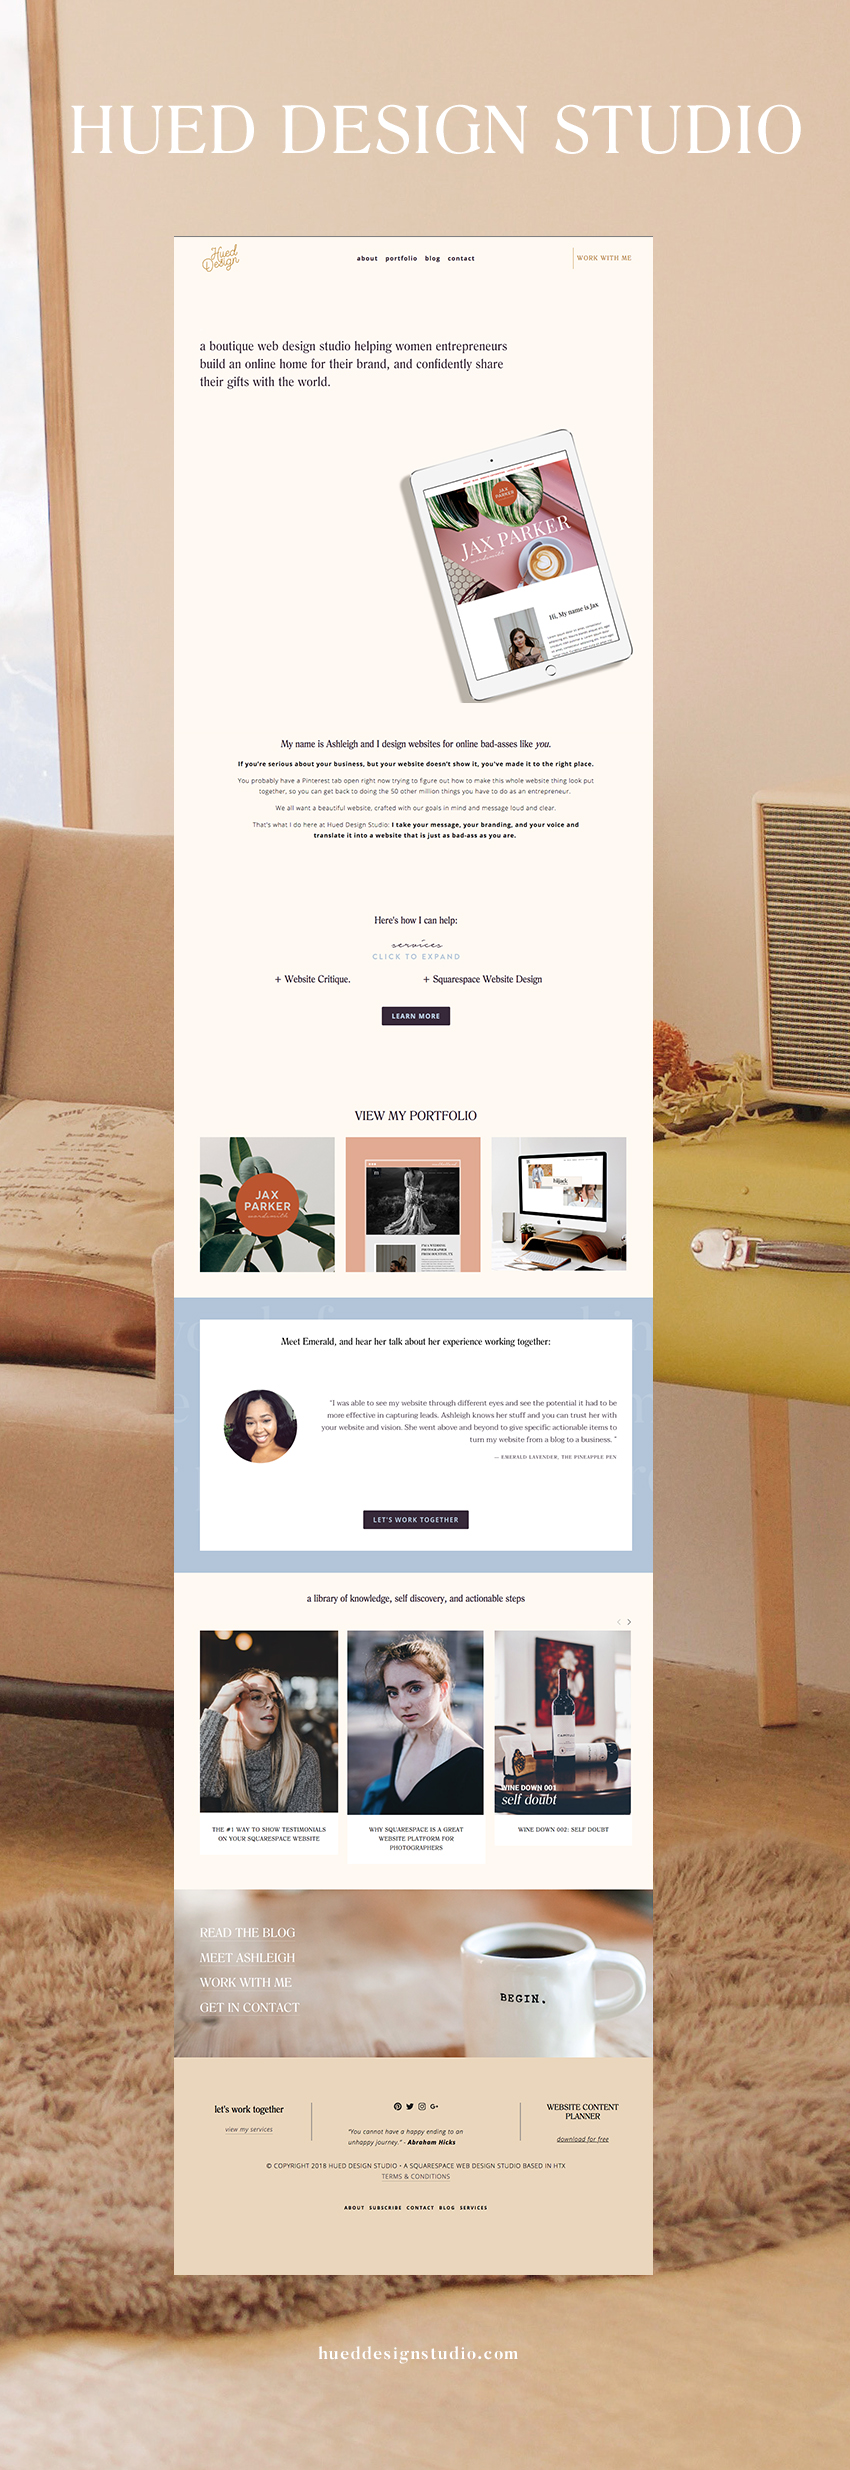 Squarespace design   How to rebrand   Branding   Rebranding Process   Web Design